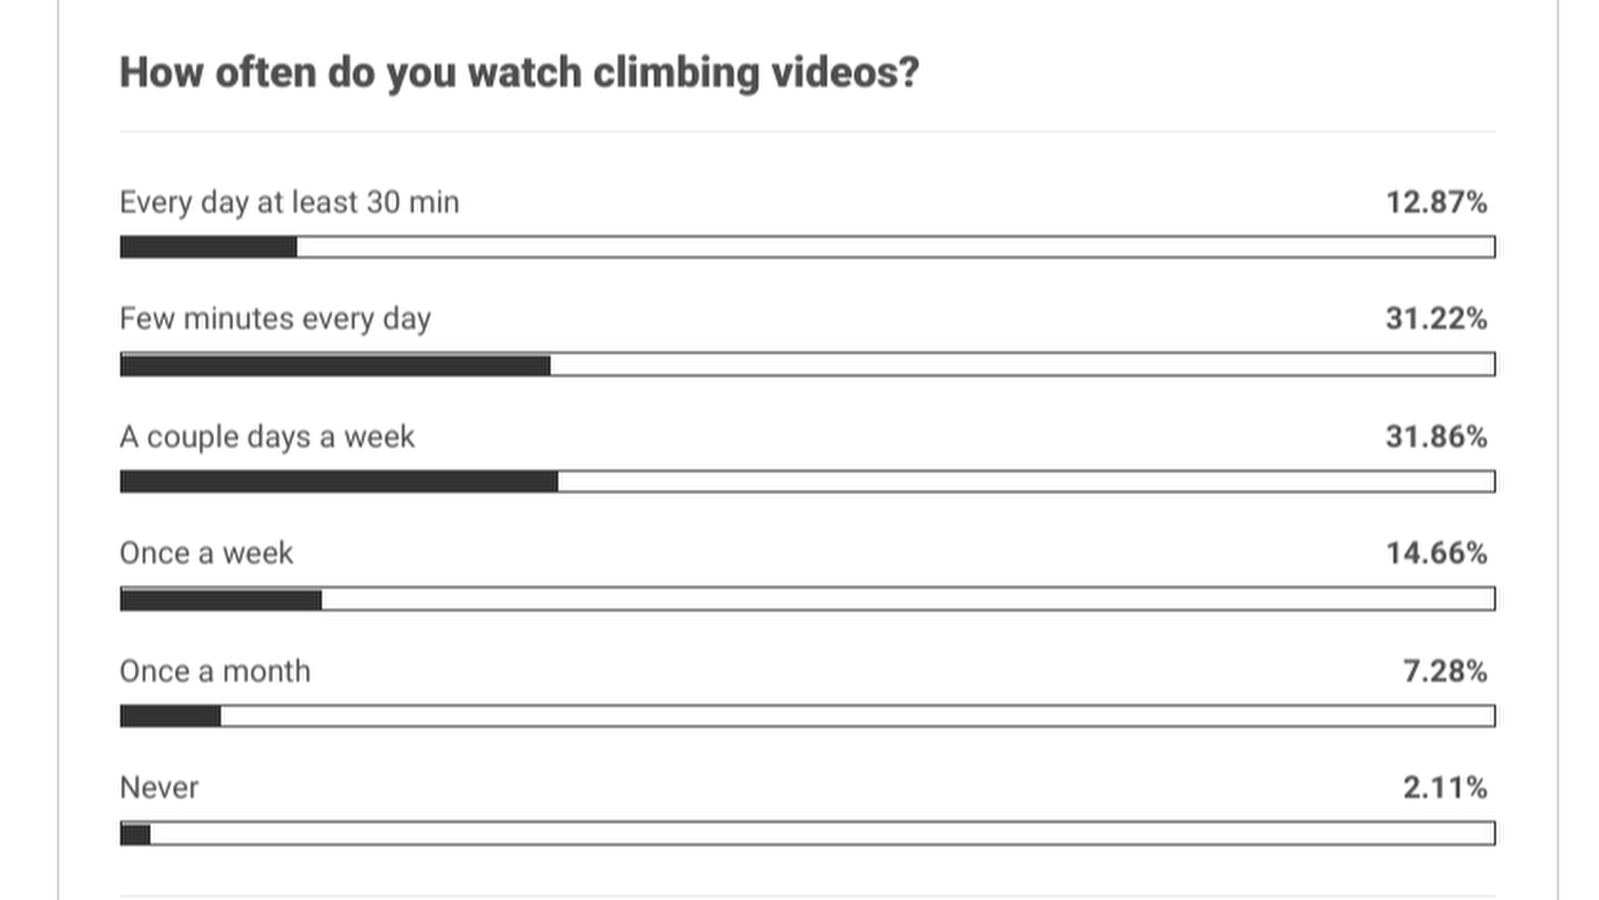 How often do you watch climbing videos?